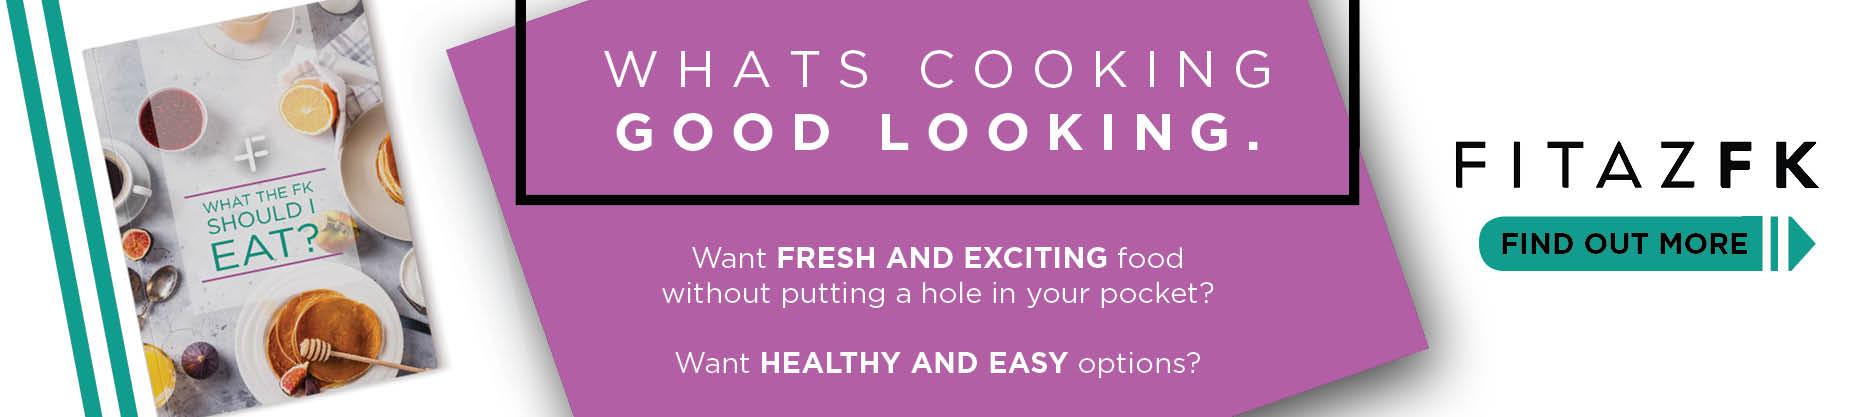 Cookbook Banner.jpg